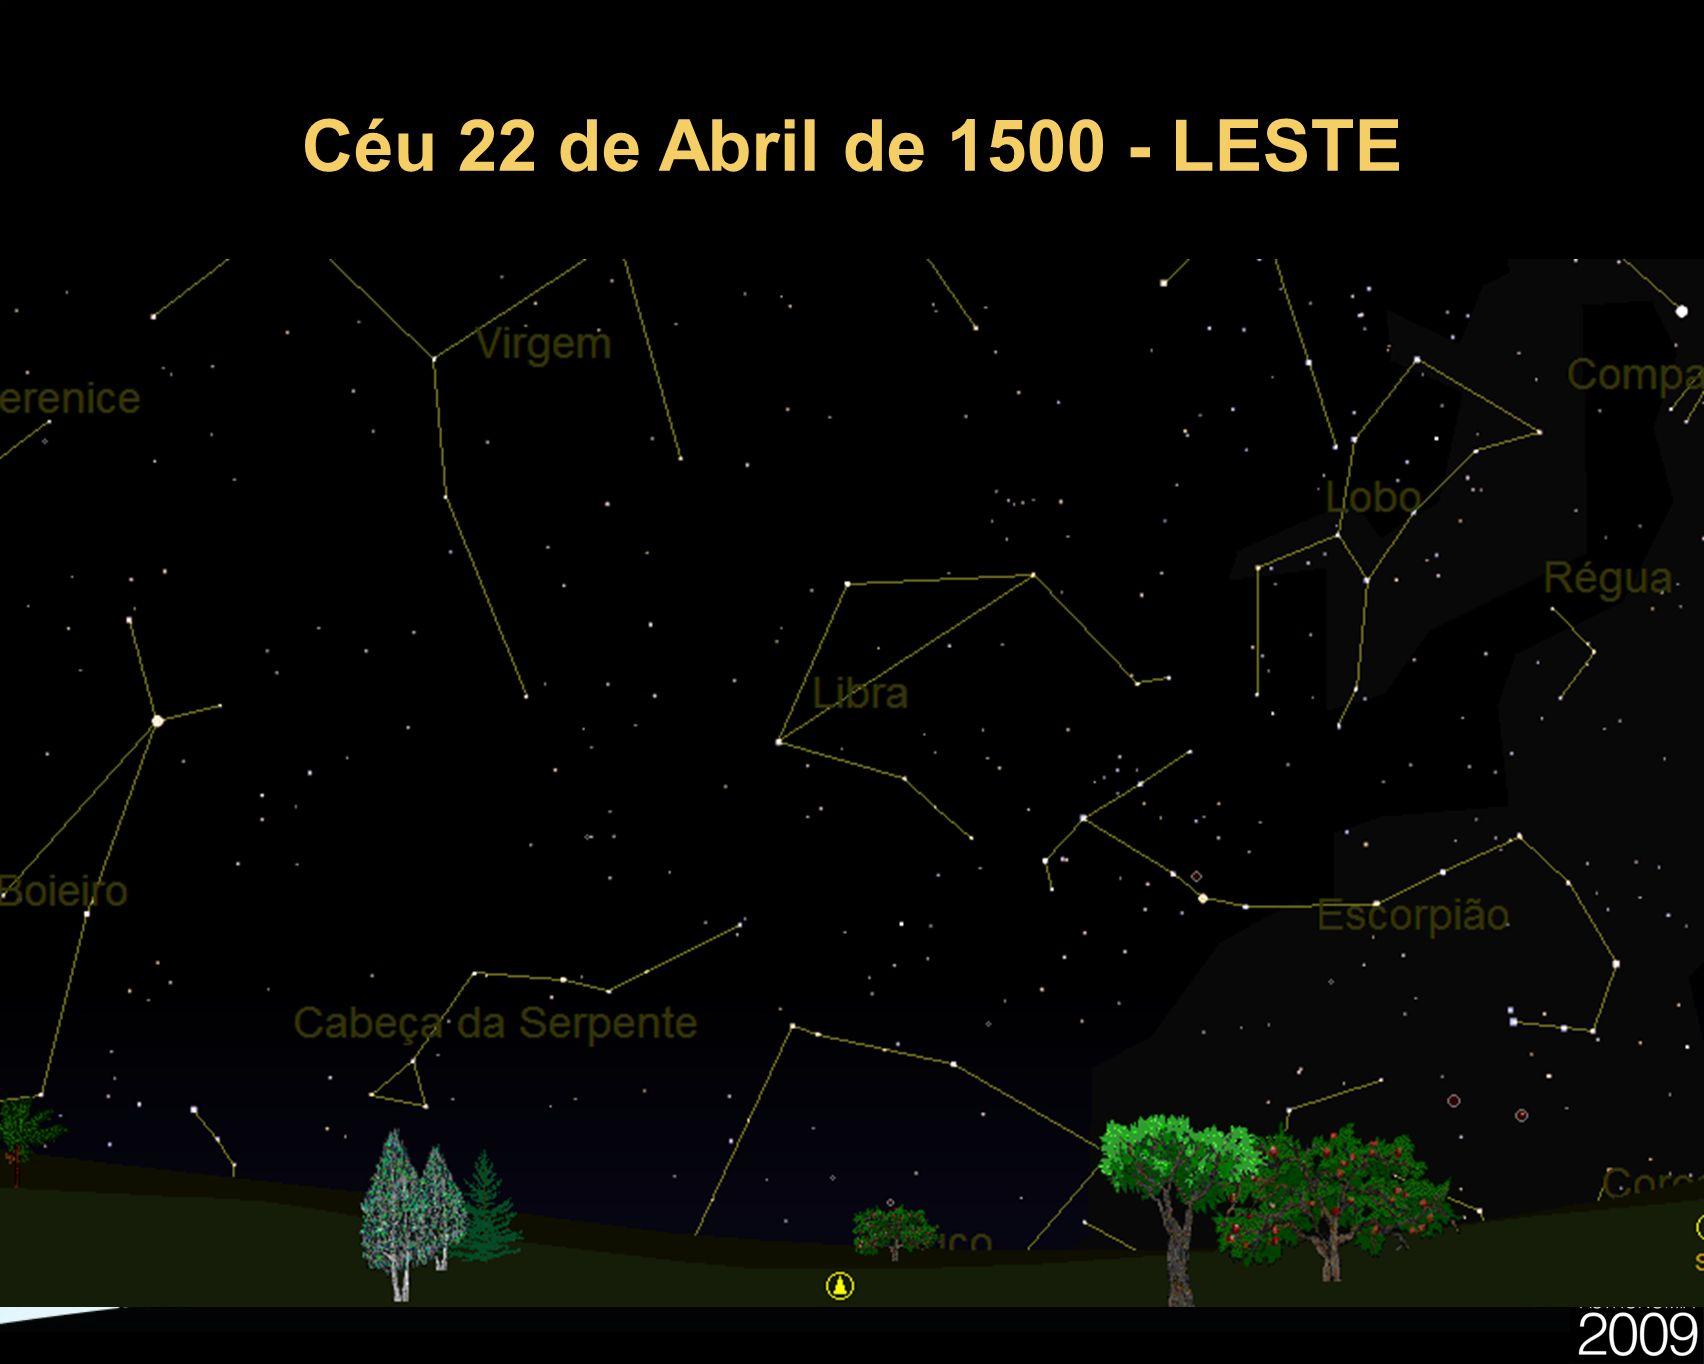 Céu 22 de Abril de 1500 - LESTE 20